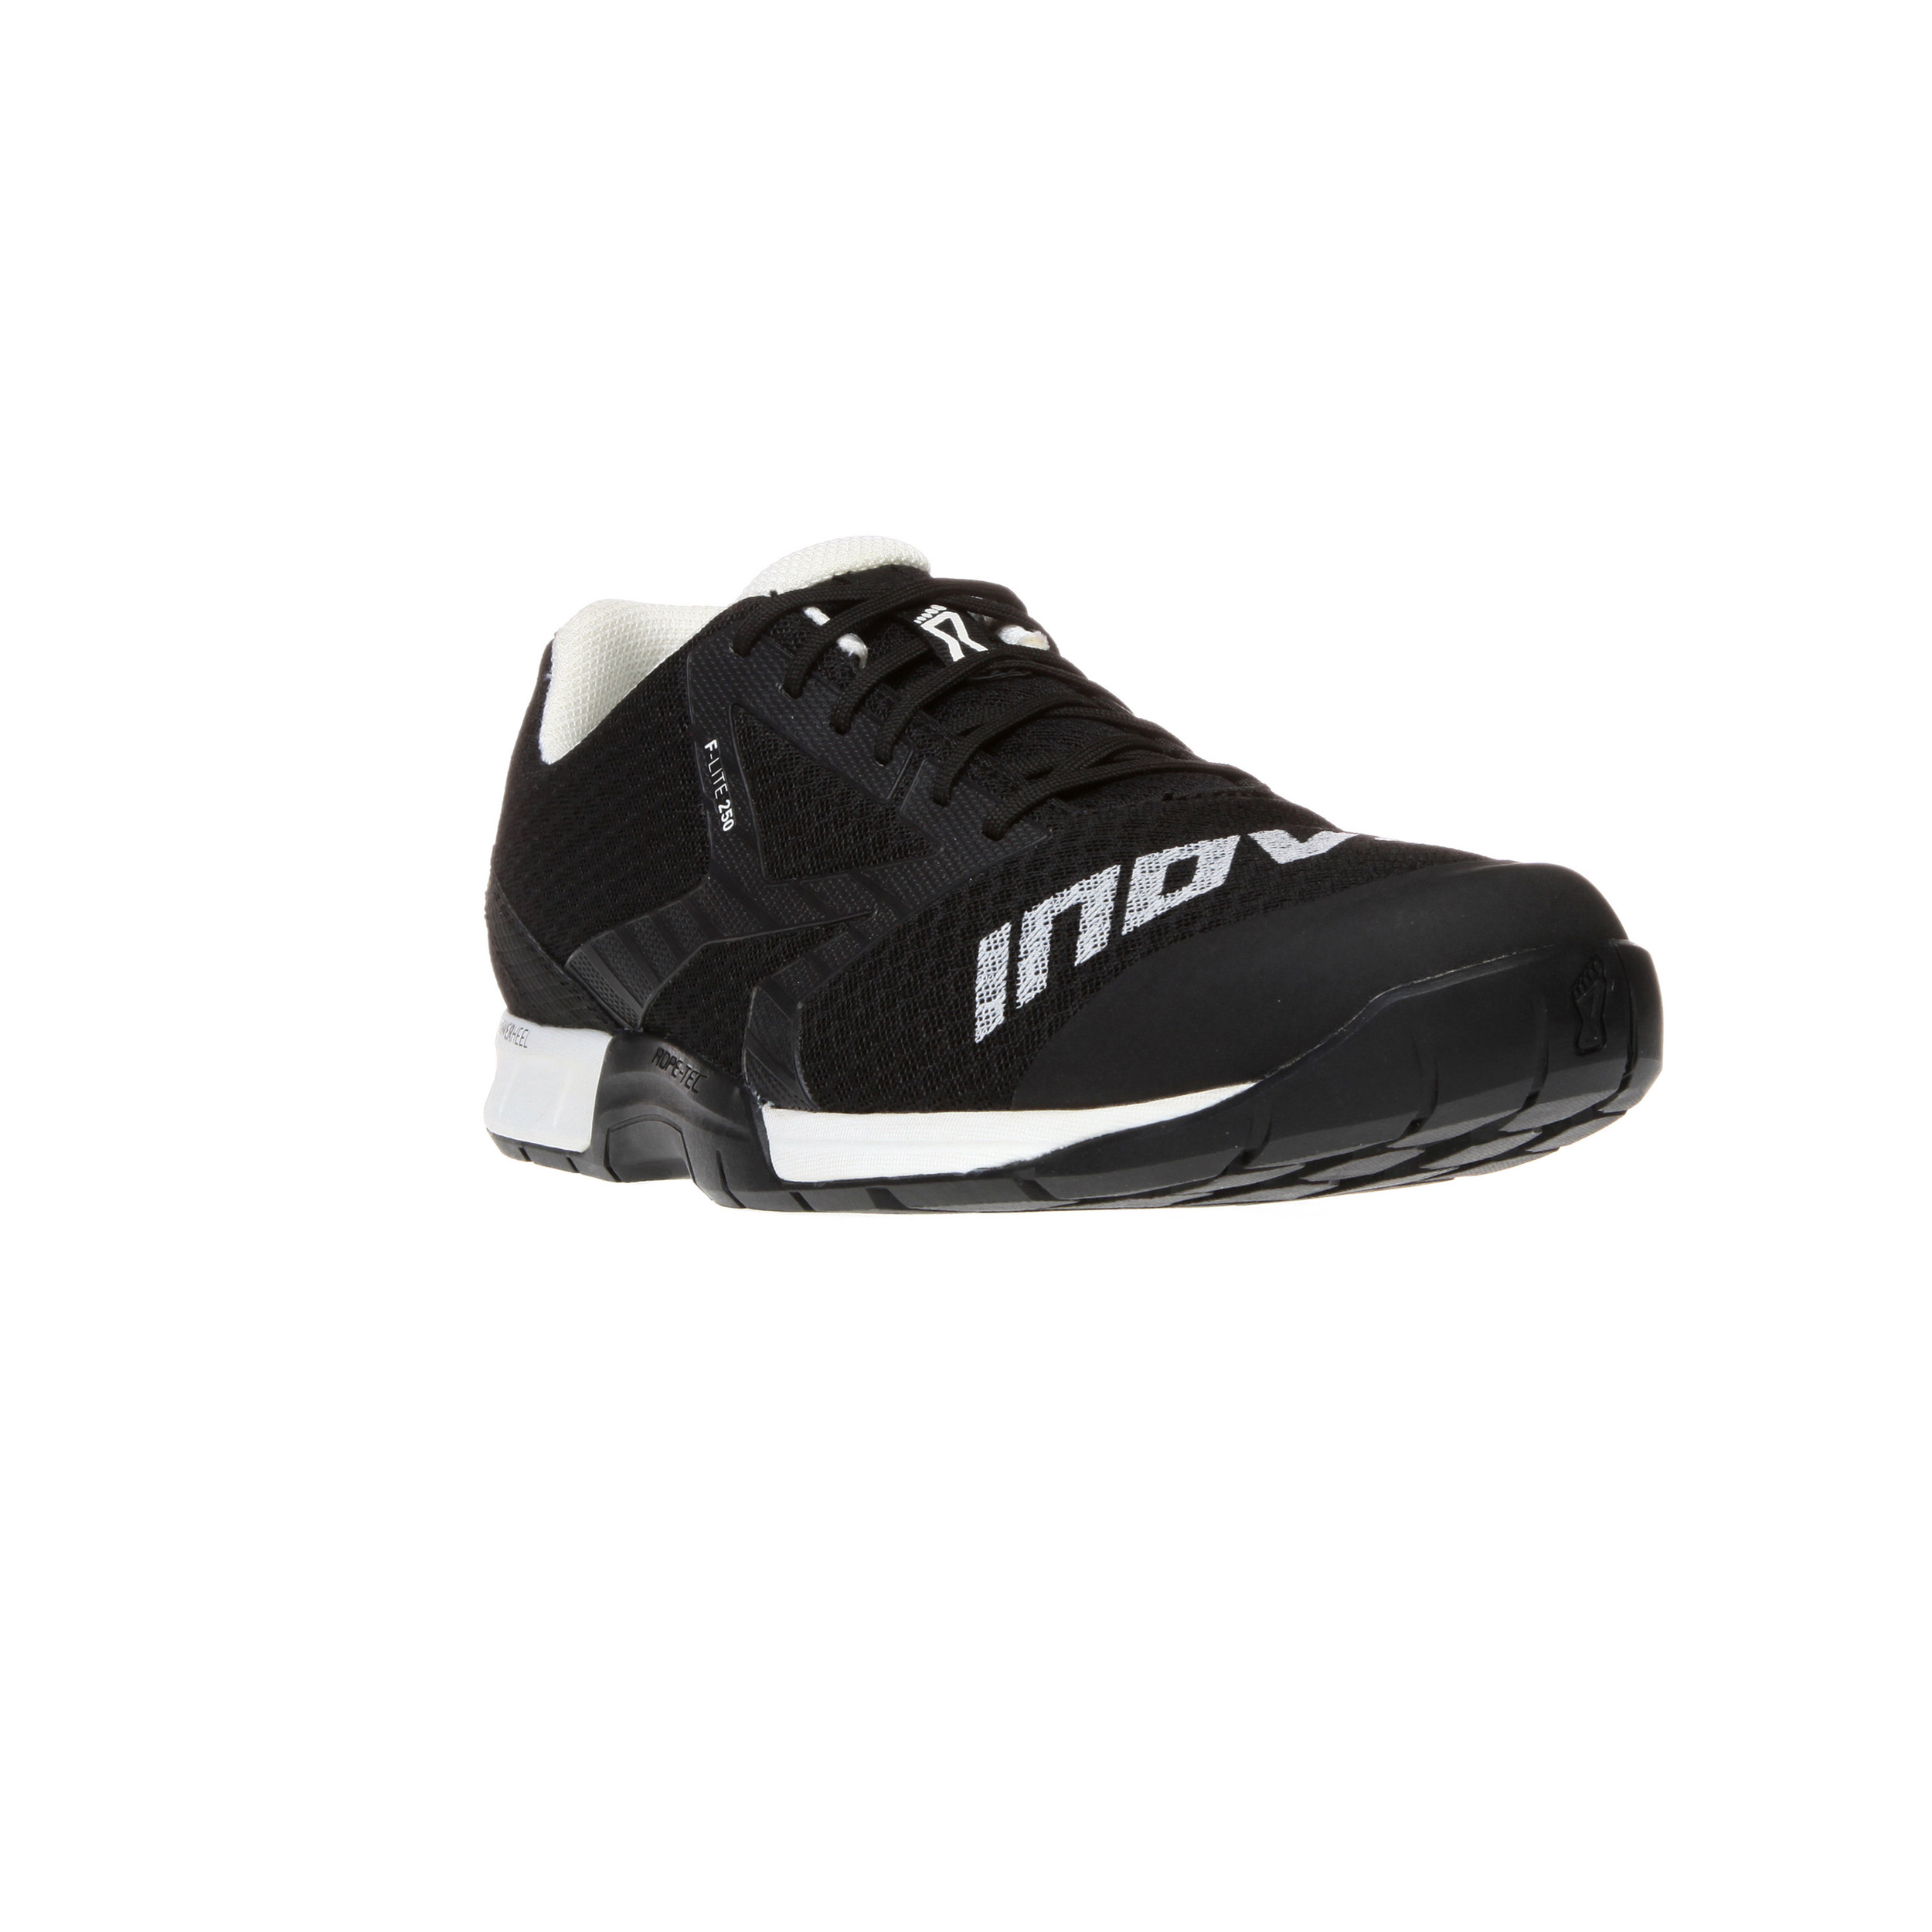 Inov8 F-Lite 250 Herren Trainingsschuhe Schuhe Sportschuhe Turnschuhe Mehrfarbig